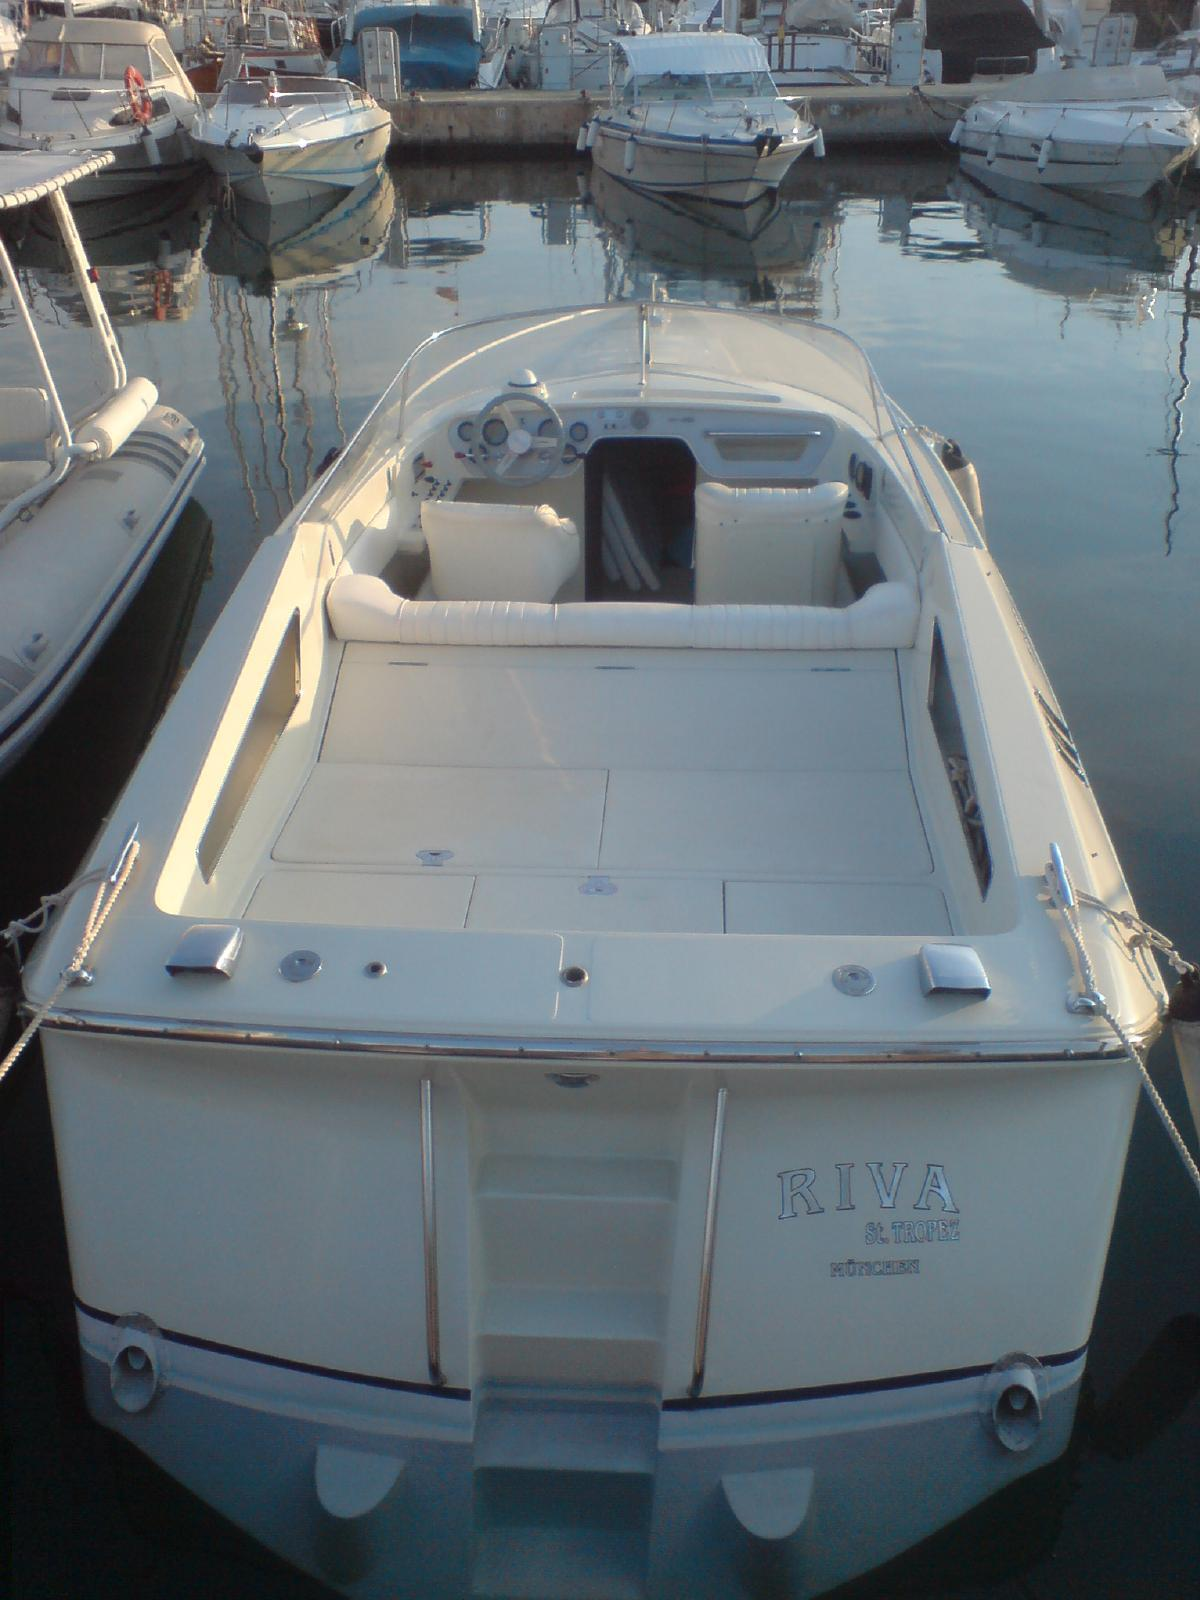 Riva Motorboot Motoryacht Gleiter Offshore Powerboot